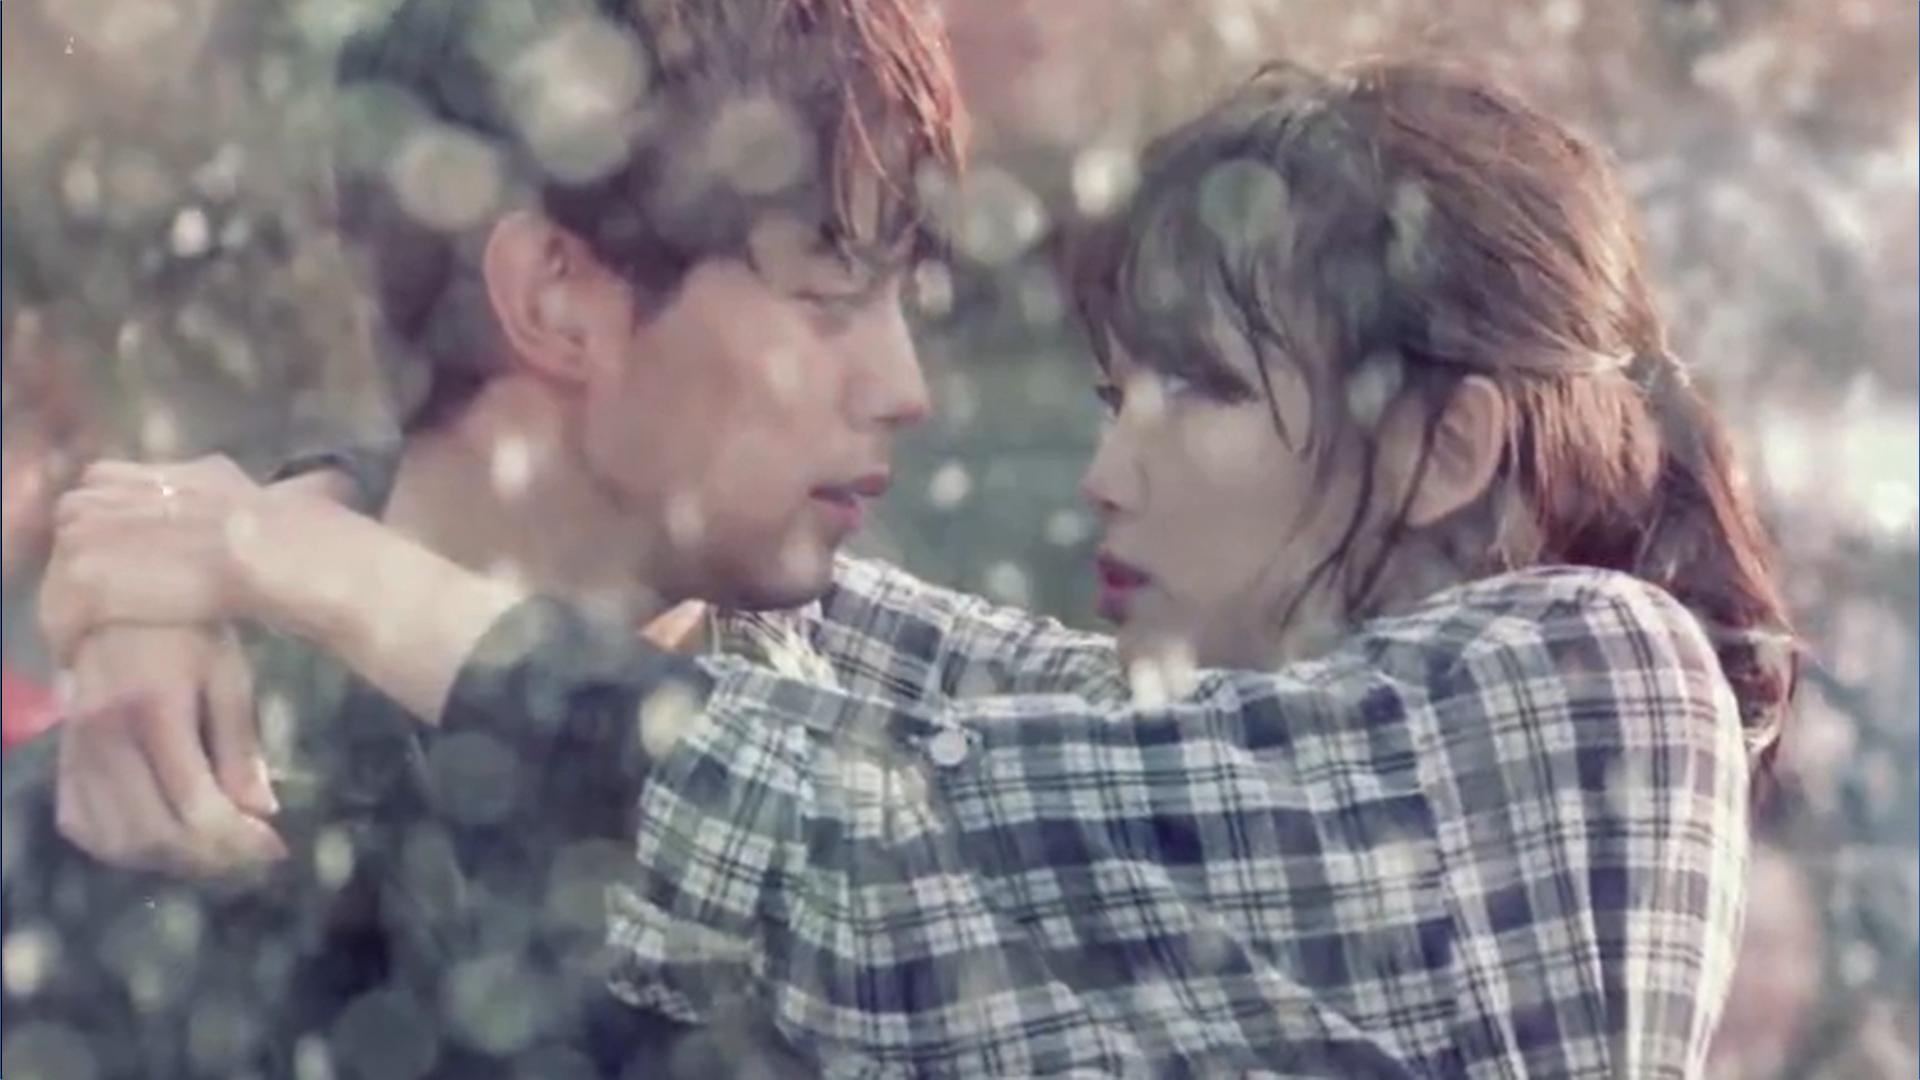 Wednesday 3:30 PM Yoon Jae-won carrying Seon Eun-woo in his arms